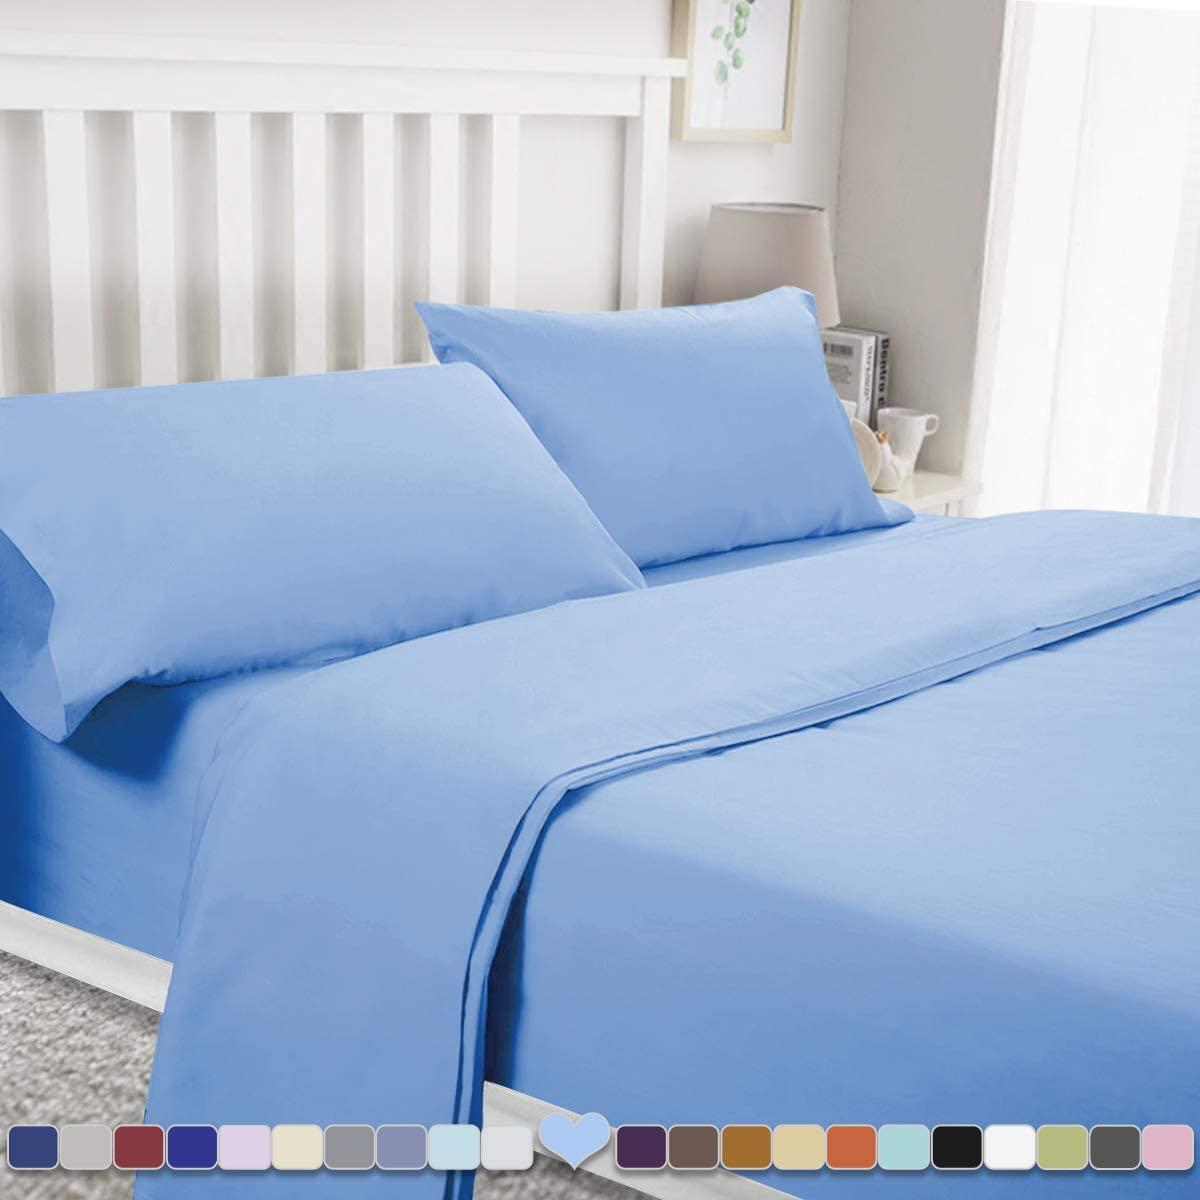 BYSURE 4 Pieces Full Bed Sheet Set - 1800 Soft Durable Brushed Microfiber, 15 Inch Deep Pockets, Wrinkle & Fade Resistant (Full, Sky Blue)